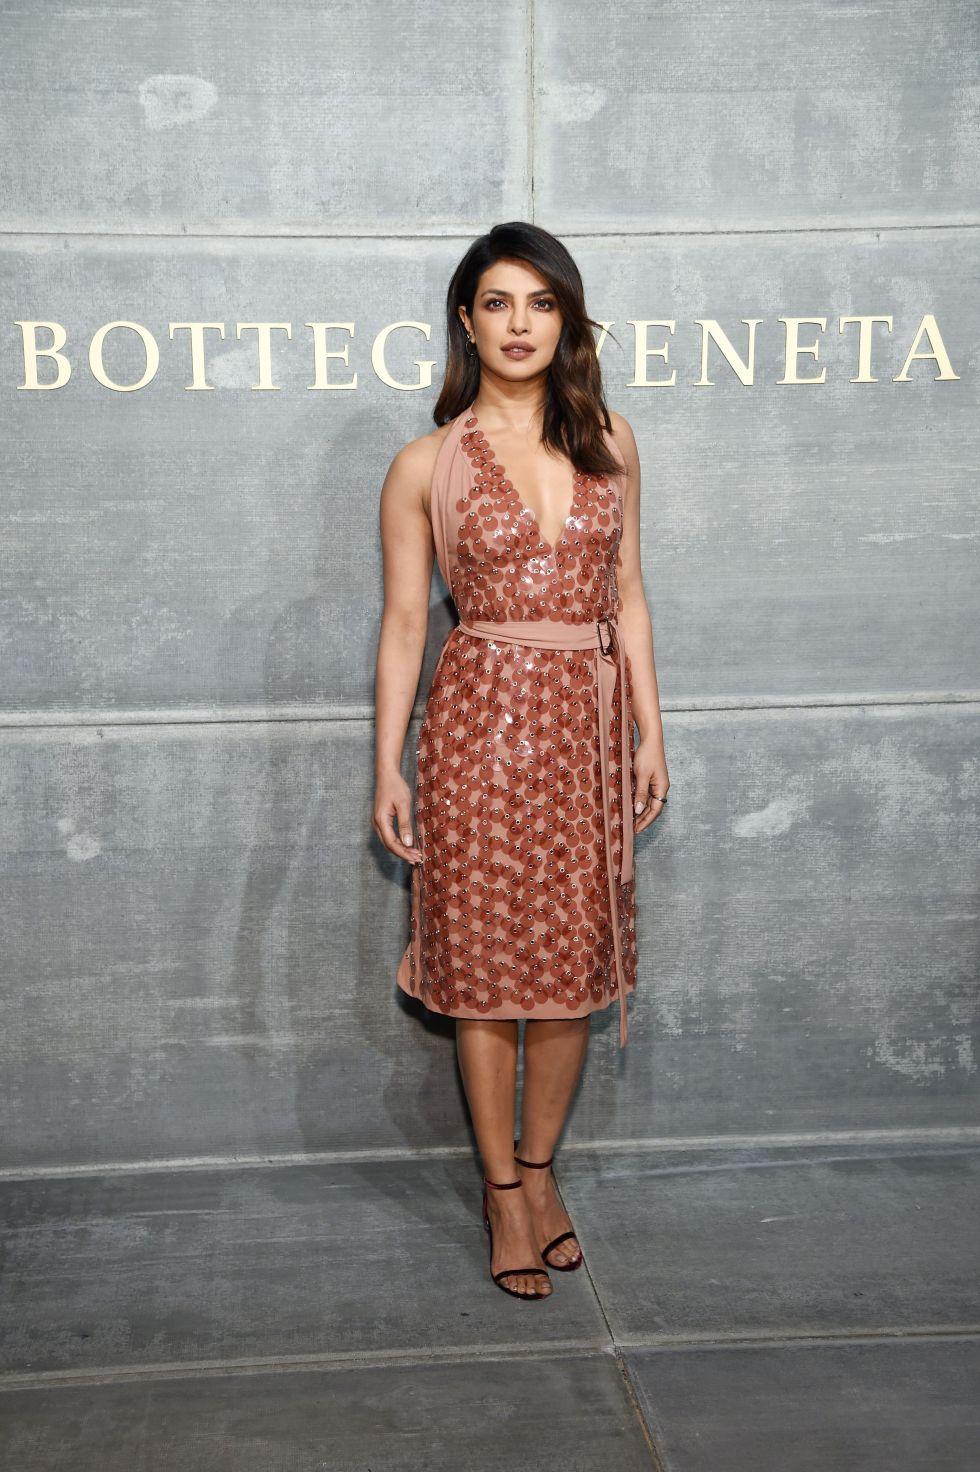 Priyanka Chopra Bottega Veneta to the Bottega Veneta show in New York